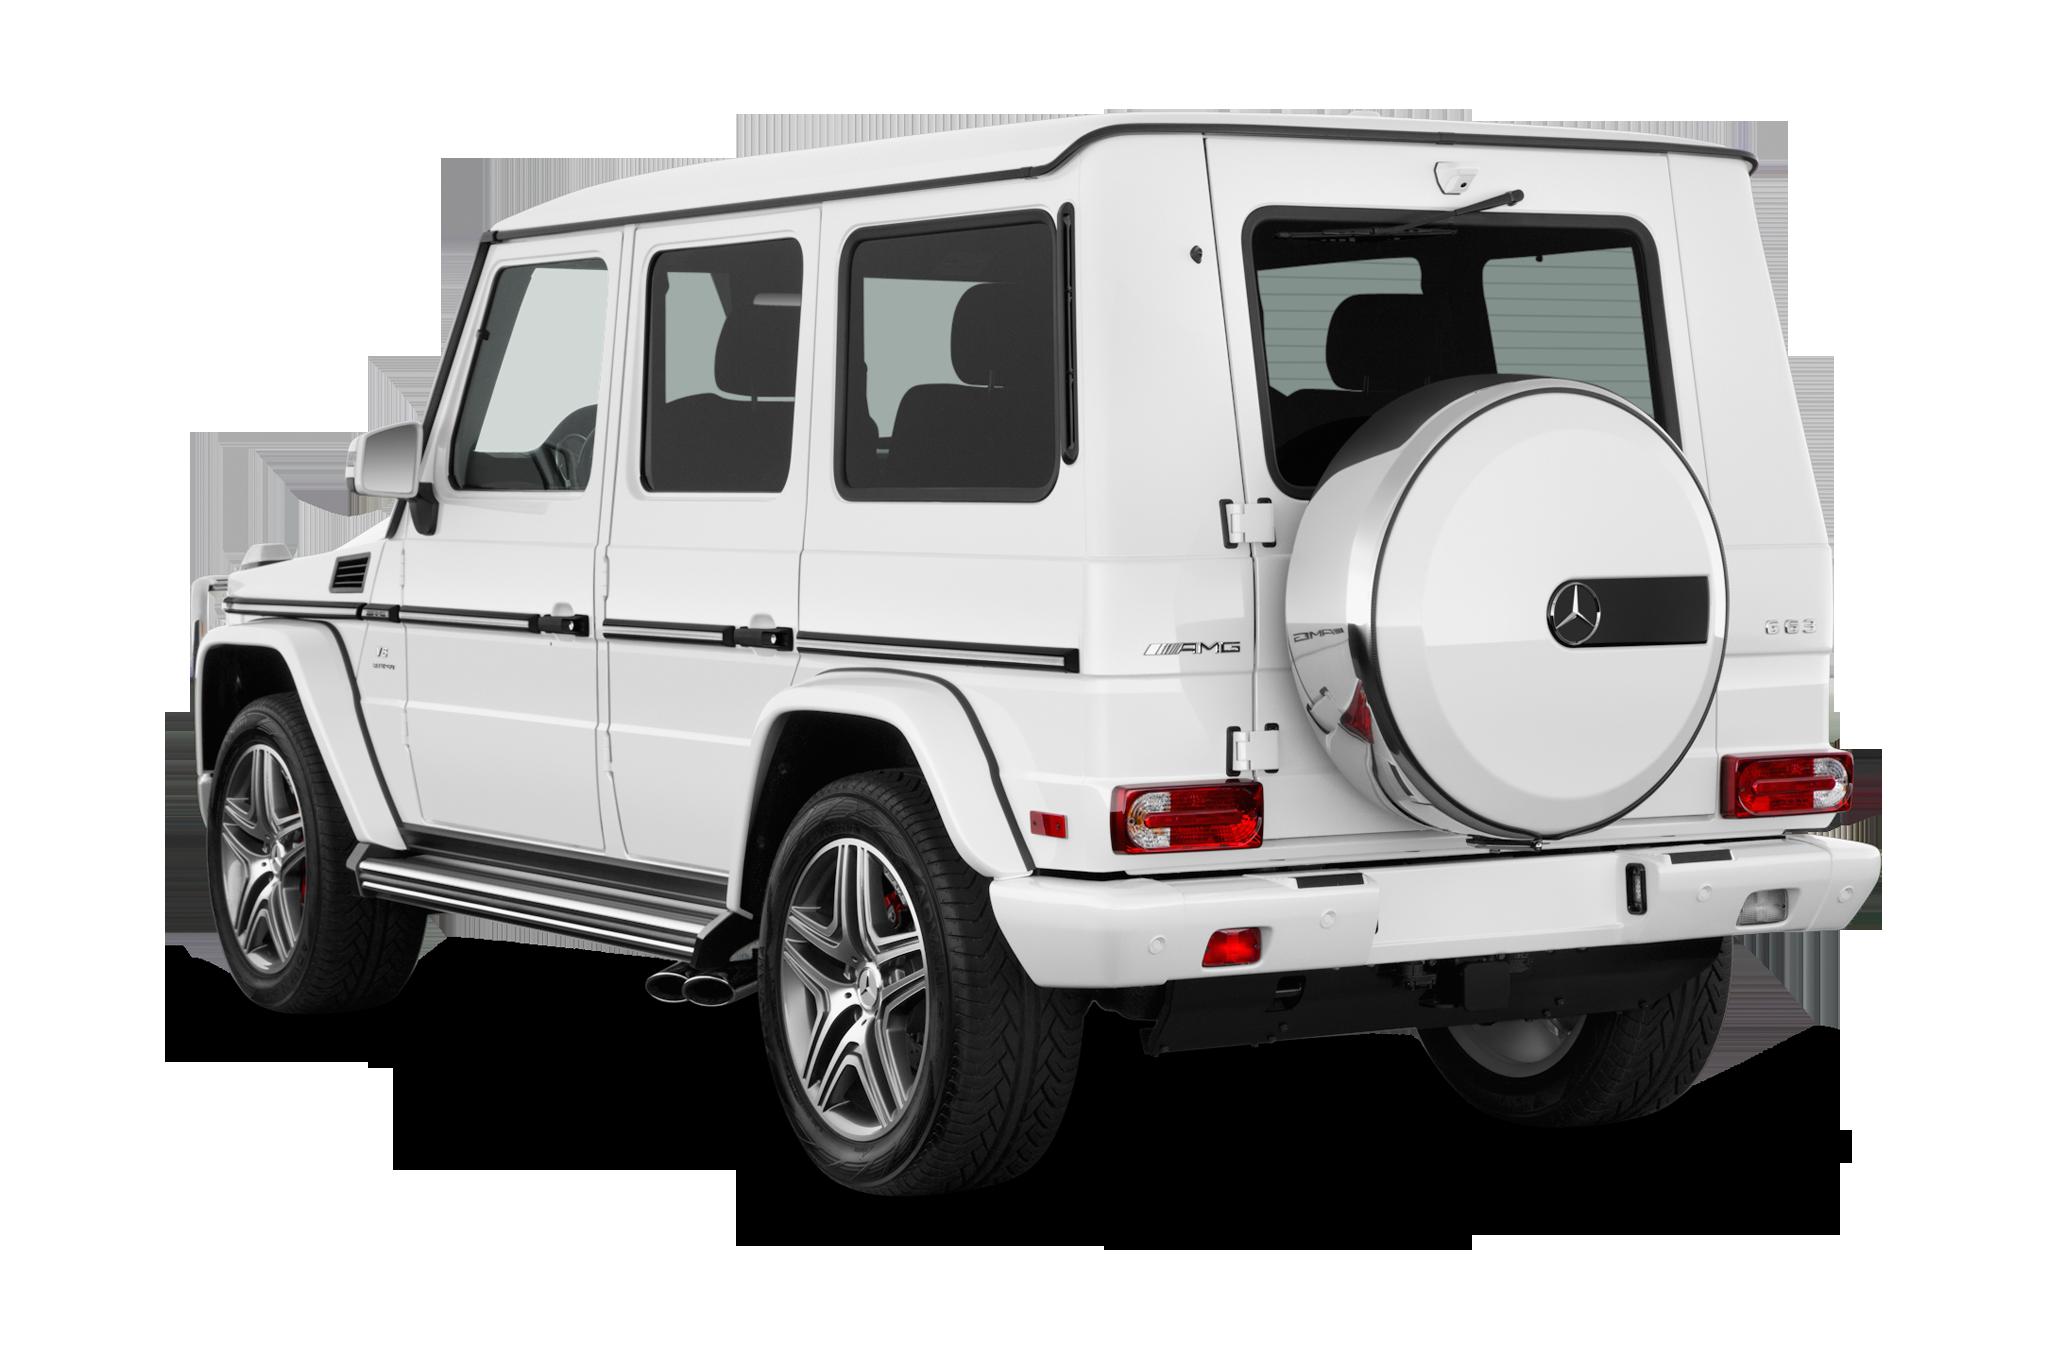 http://st.automobilemag.com/uploads/sites/10/2016/07/2016-mercedes-benz-g-class-amg-g63-suv-angular-rear.png